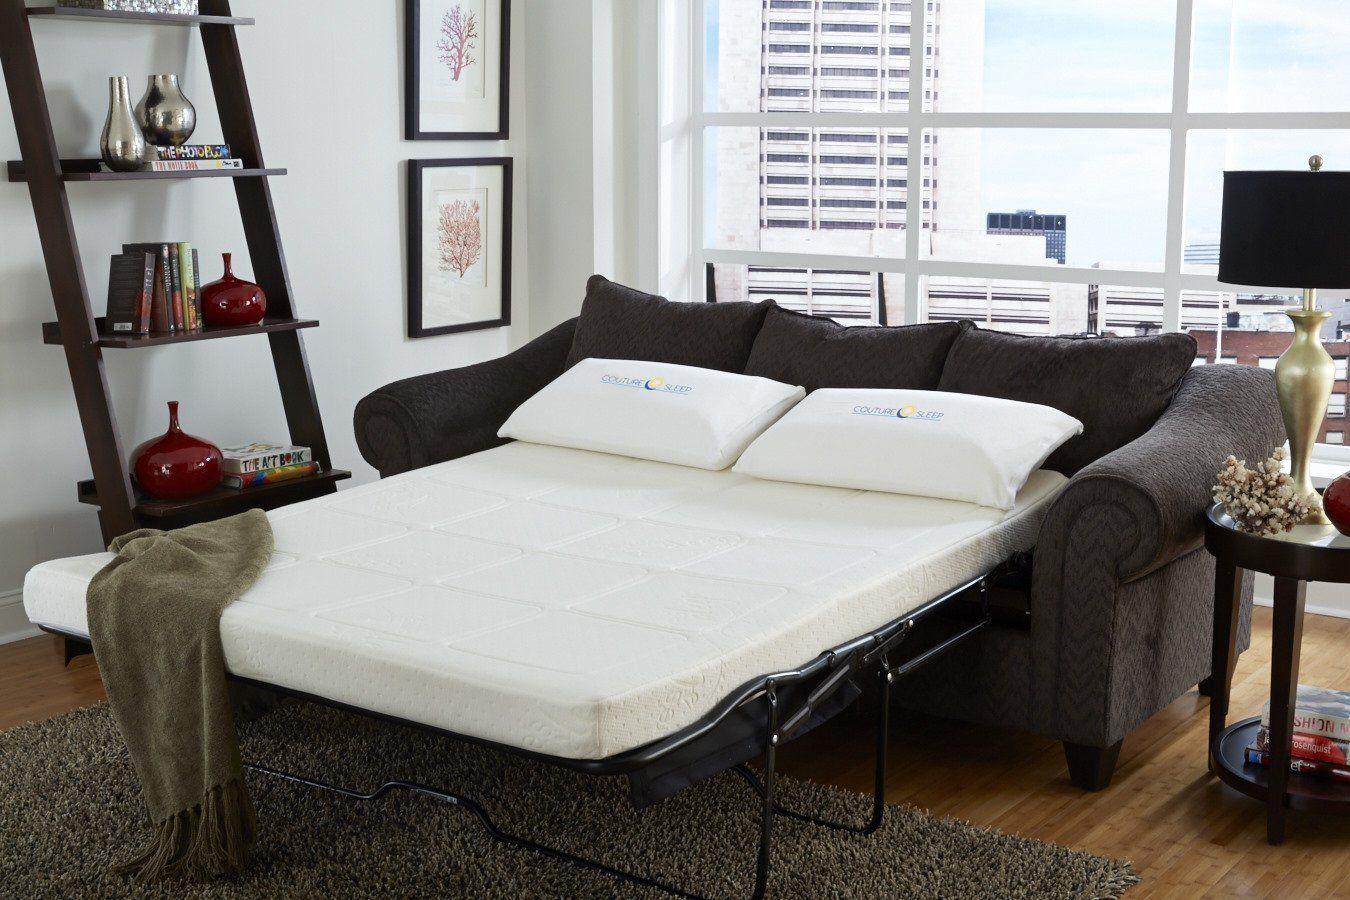 CoutureSleep New Gel Memory Foam Sofabed Sleeper mattress